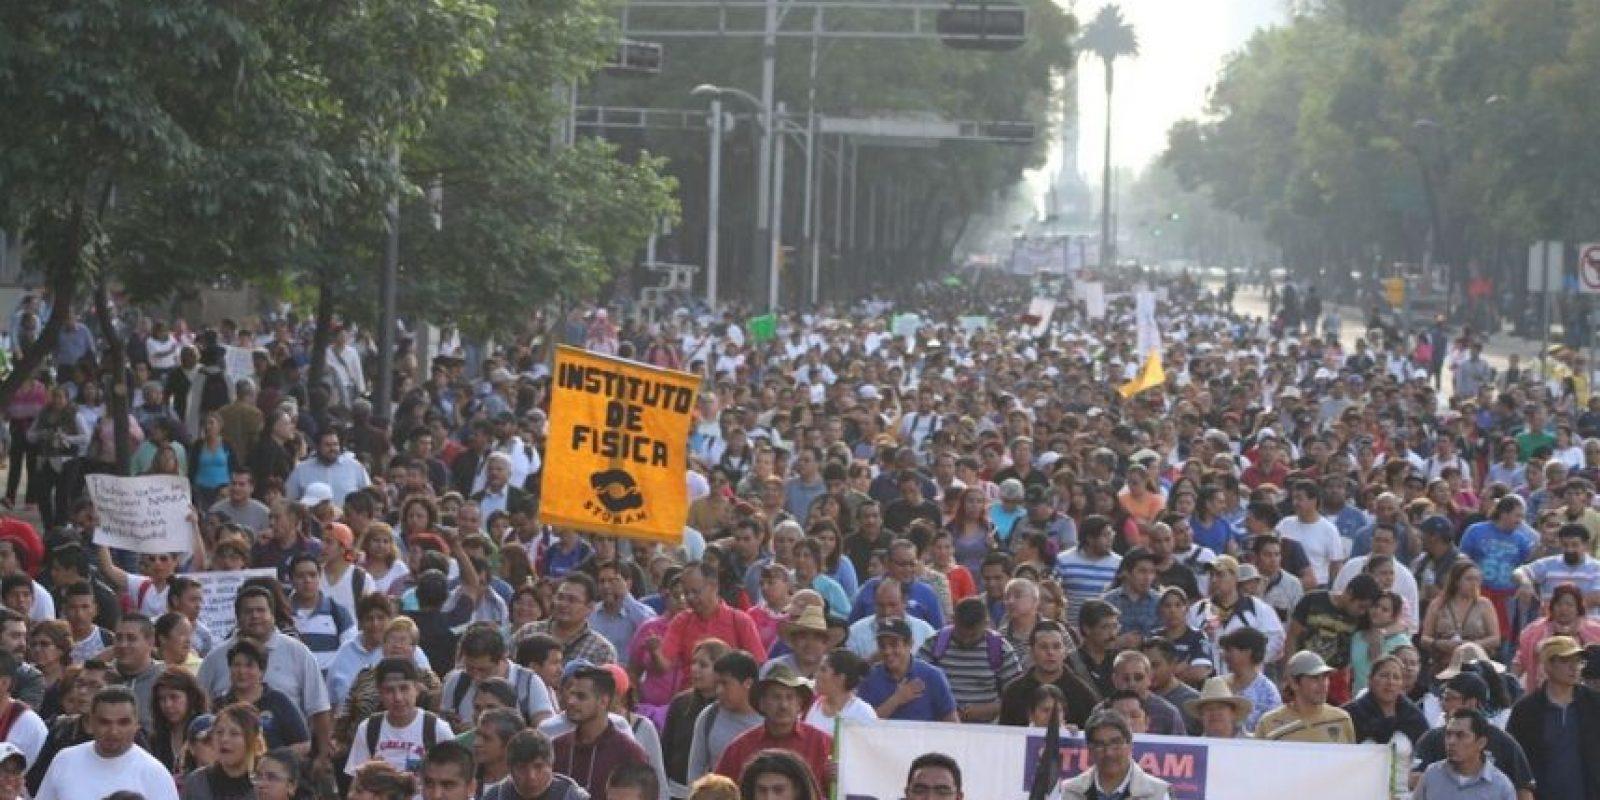 Foto:Nicolás Corte/Publimetro México